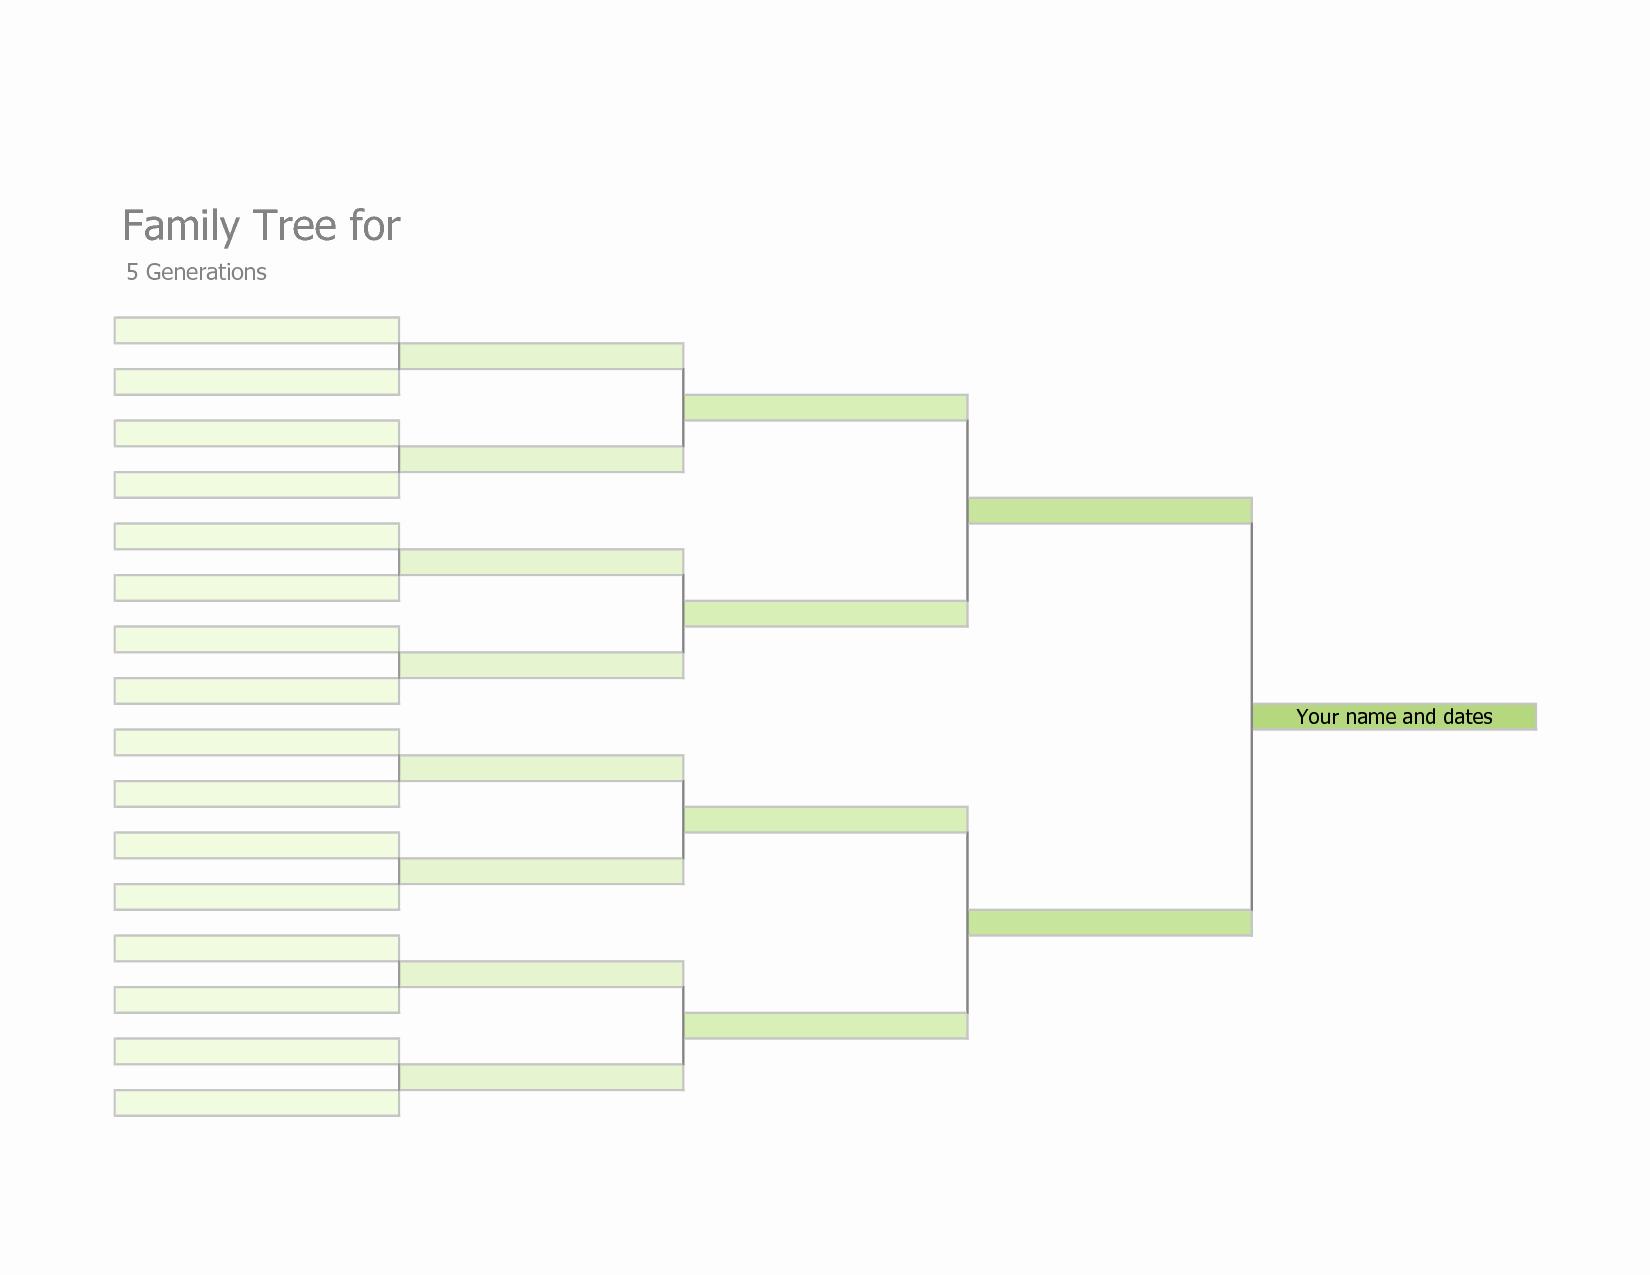 7 Generation Family Tree Template Beautiful Blank Family Tree Template